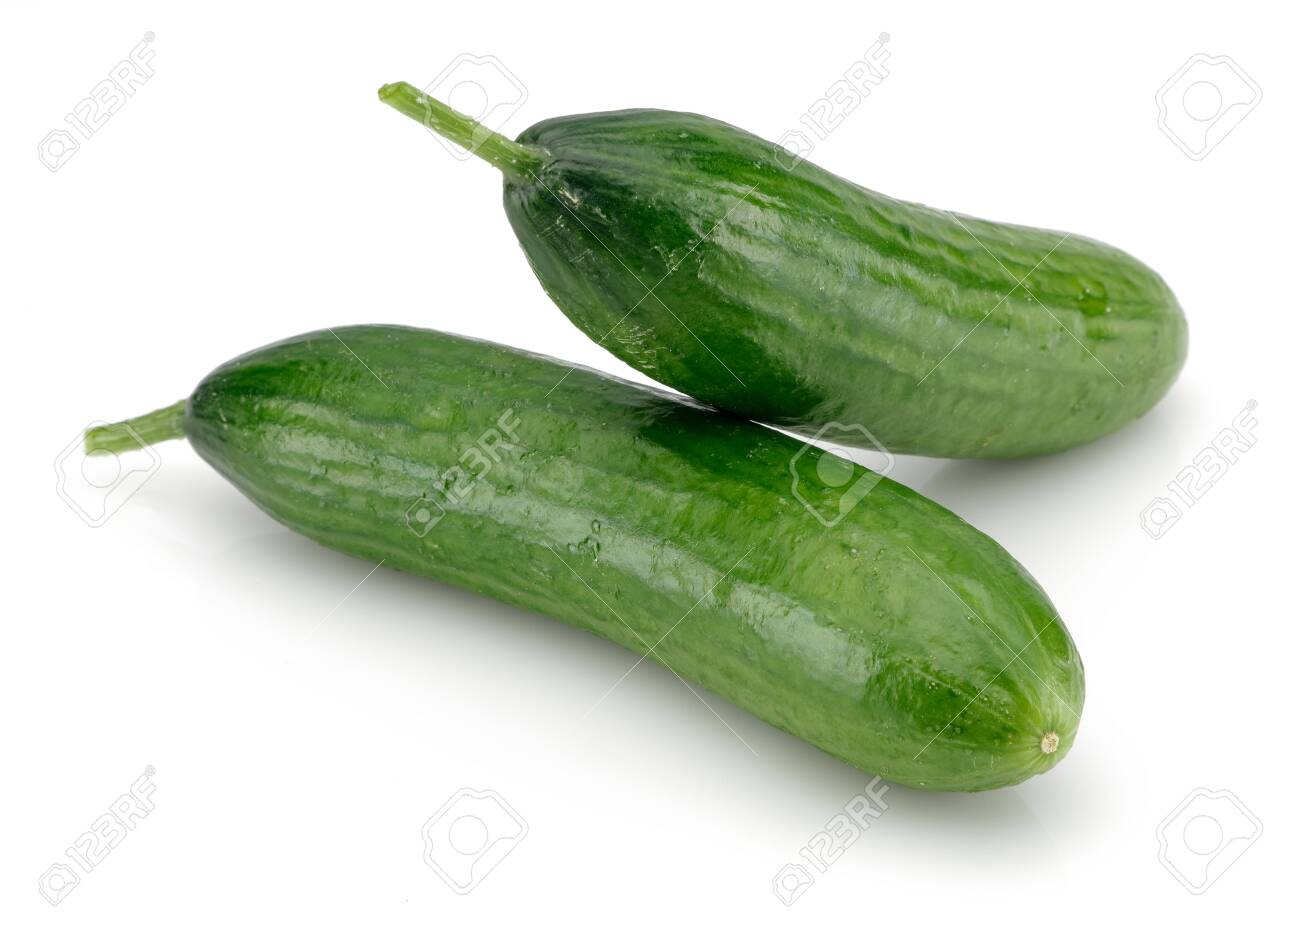 Fresh cucumbers isolated on white background - 124006161